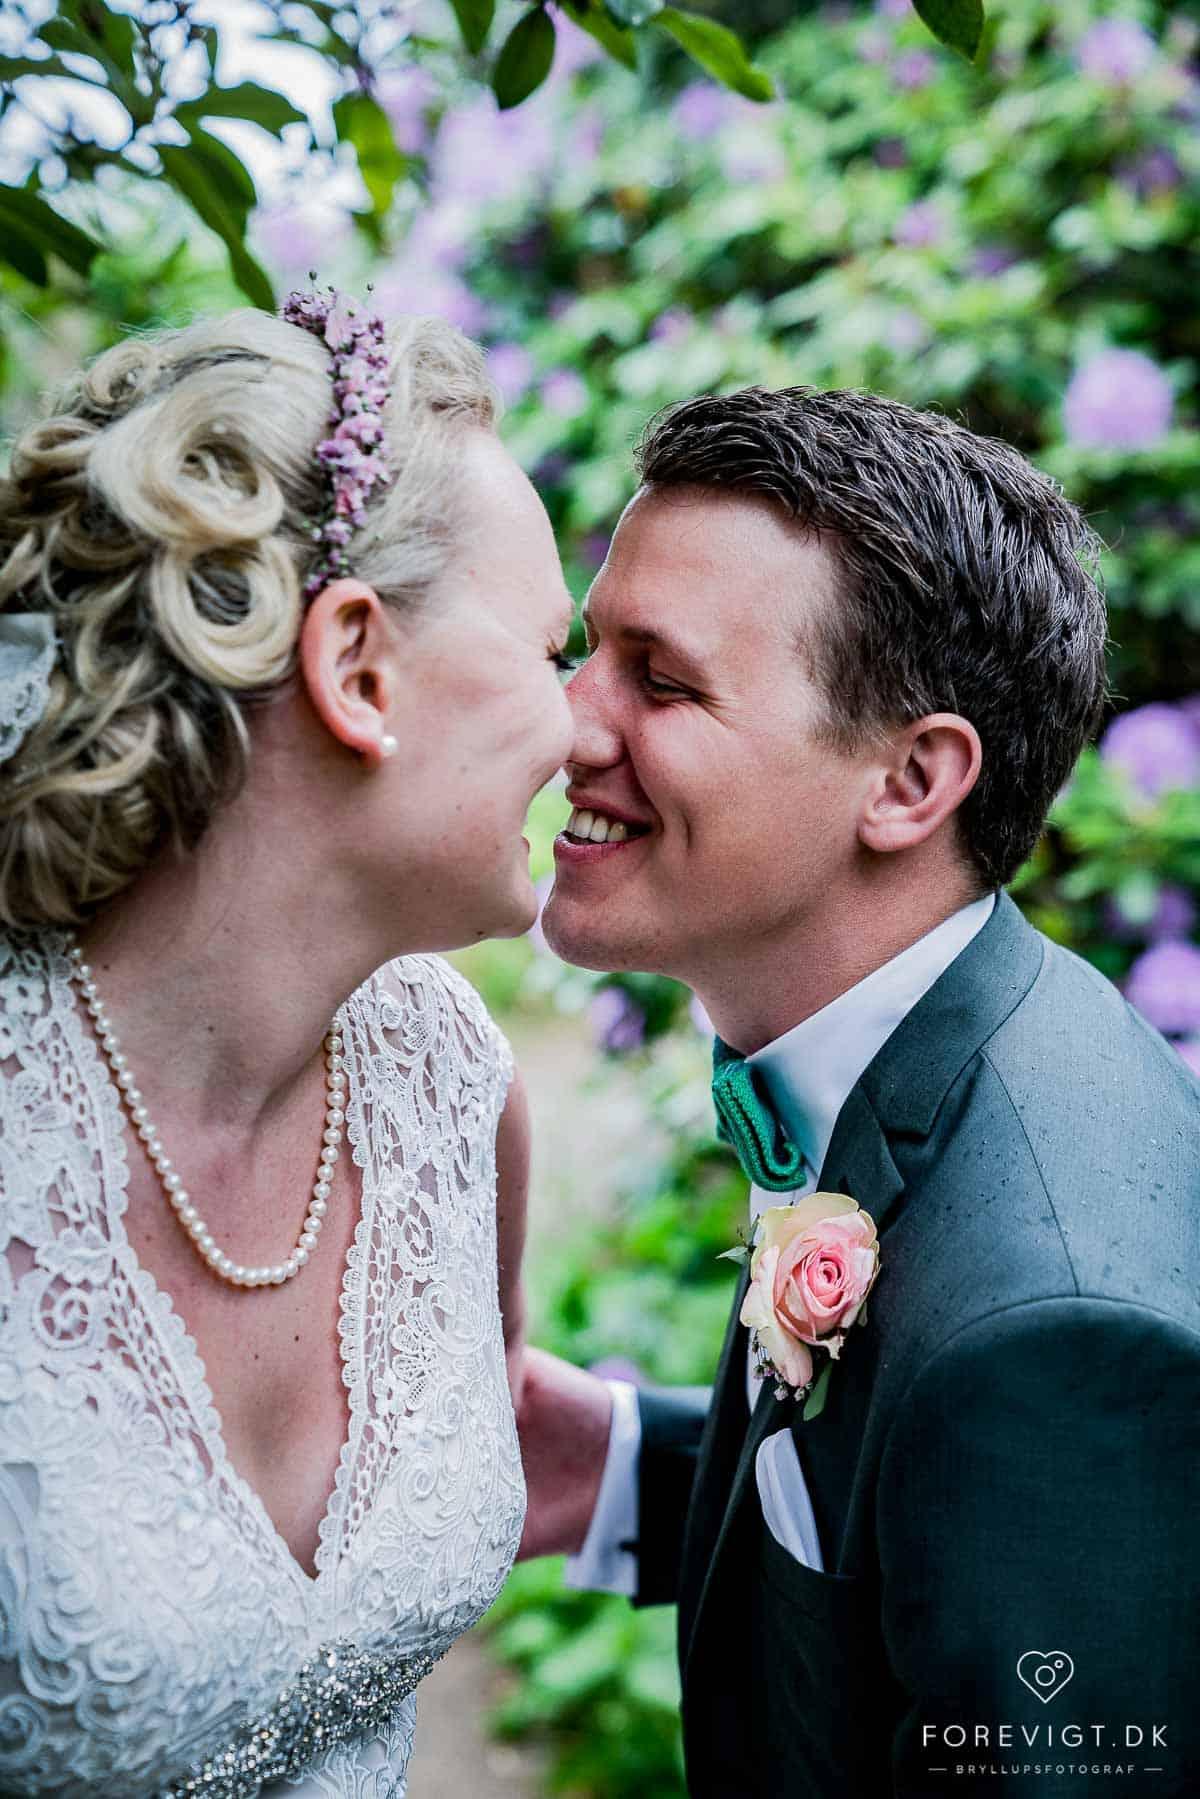 Bryllup i Vejle - Fotograf Vejle | Kjole bryllup, Brudekjole